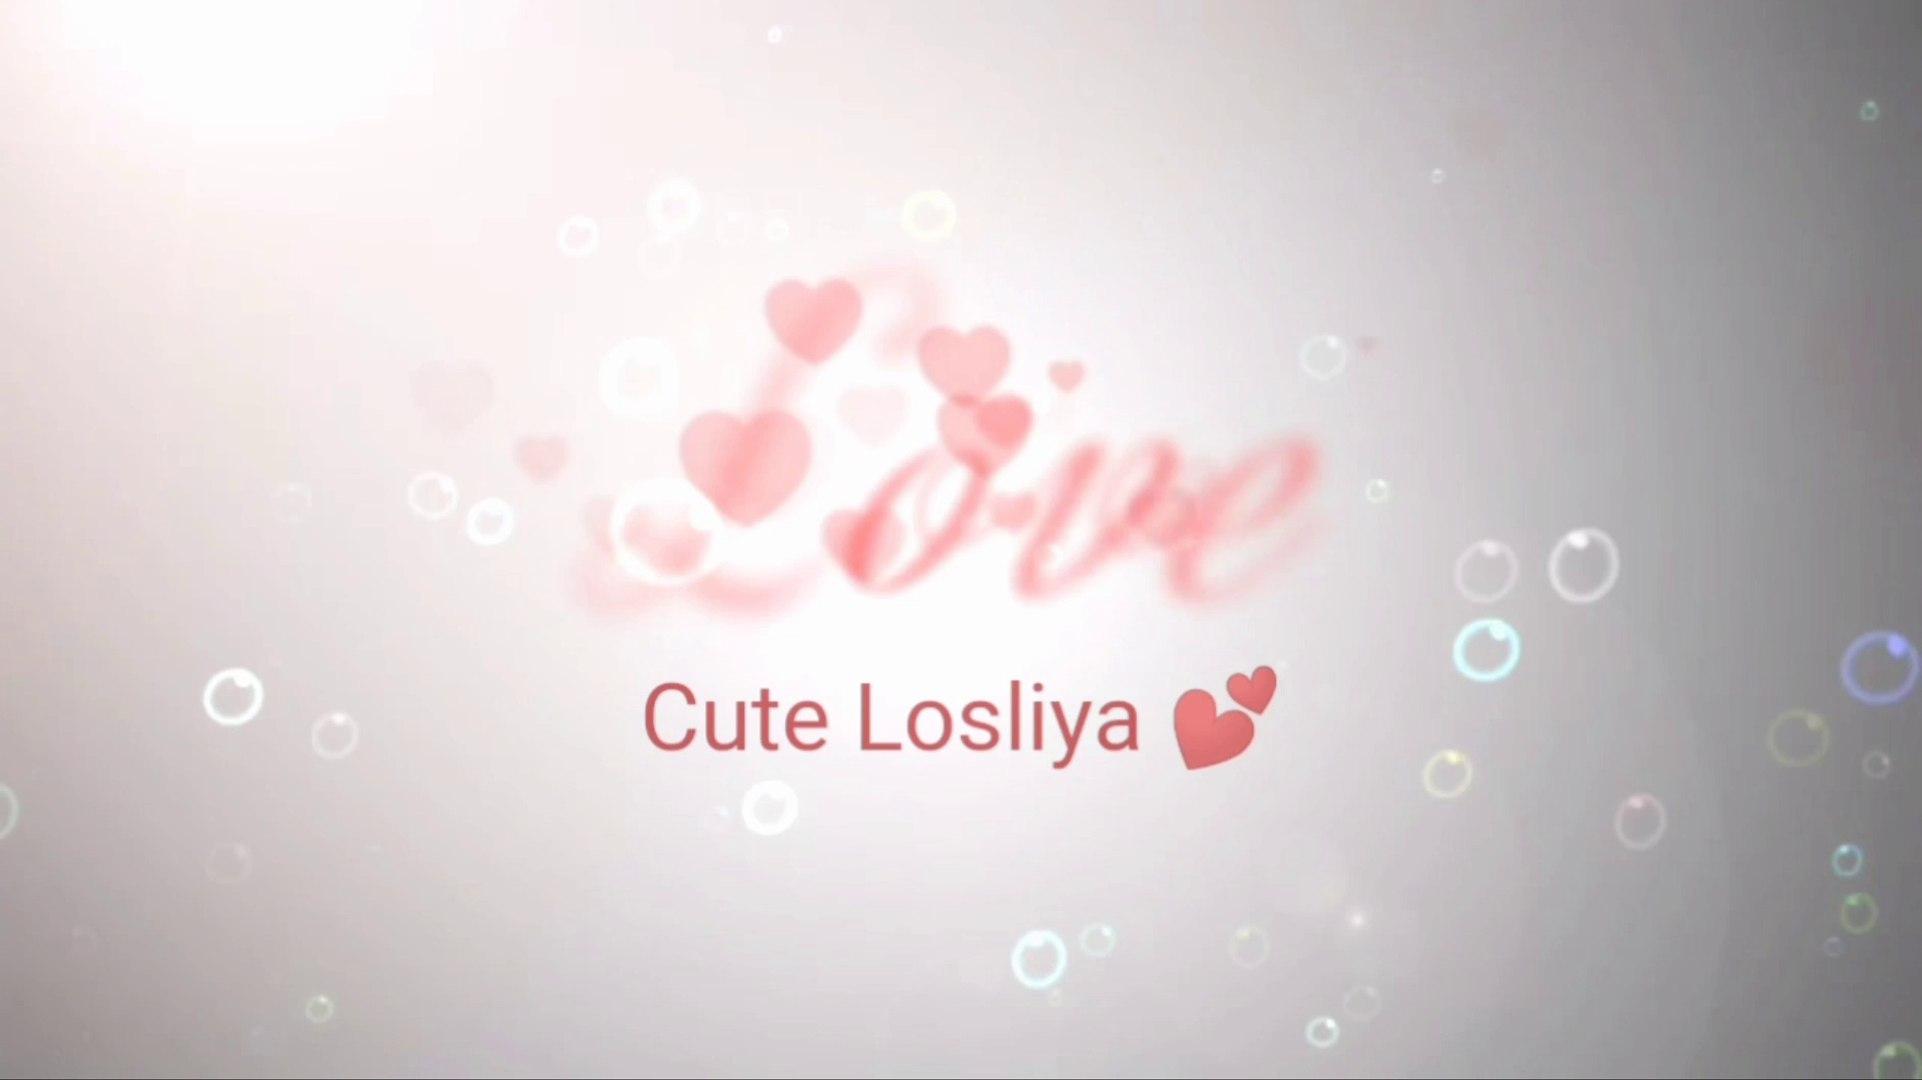 losliya WhatsApp status losliya WhatsApp status Tamil  losliya cute WhatsApp status